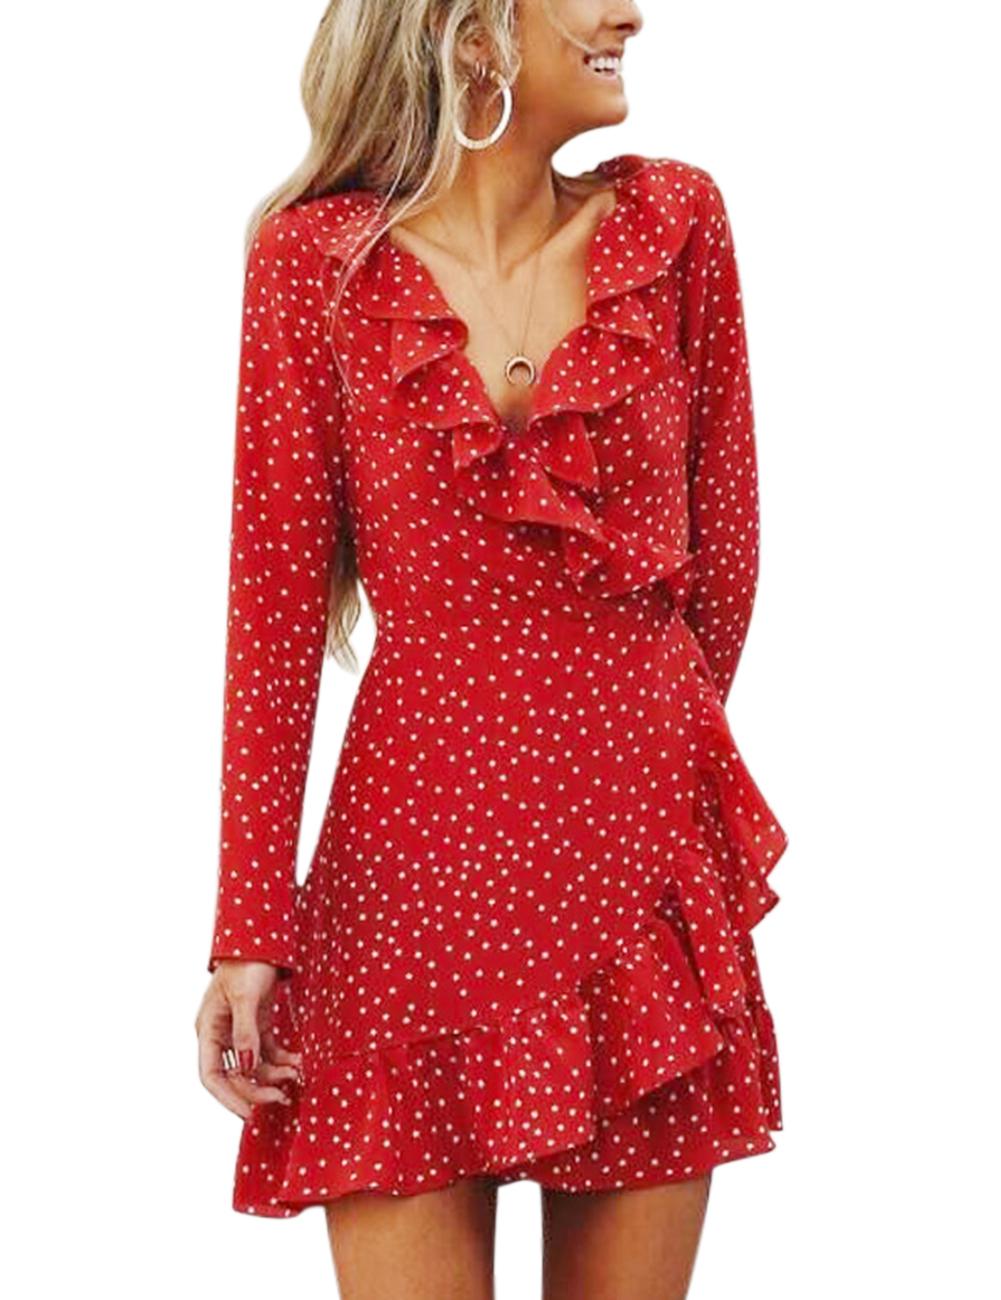 Adult Women Irregular Falbala Stars Deep V-neck Long Sleeve Chiffon Dress Flared Skirt red_XL